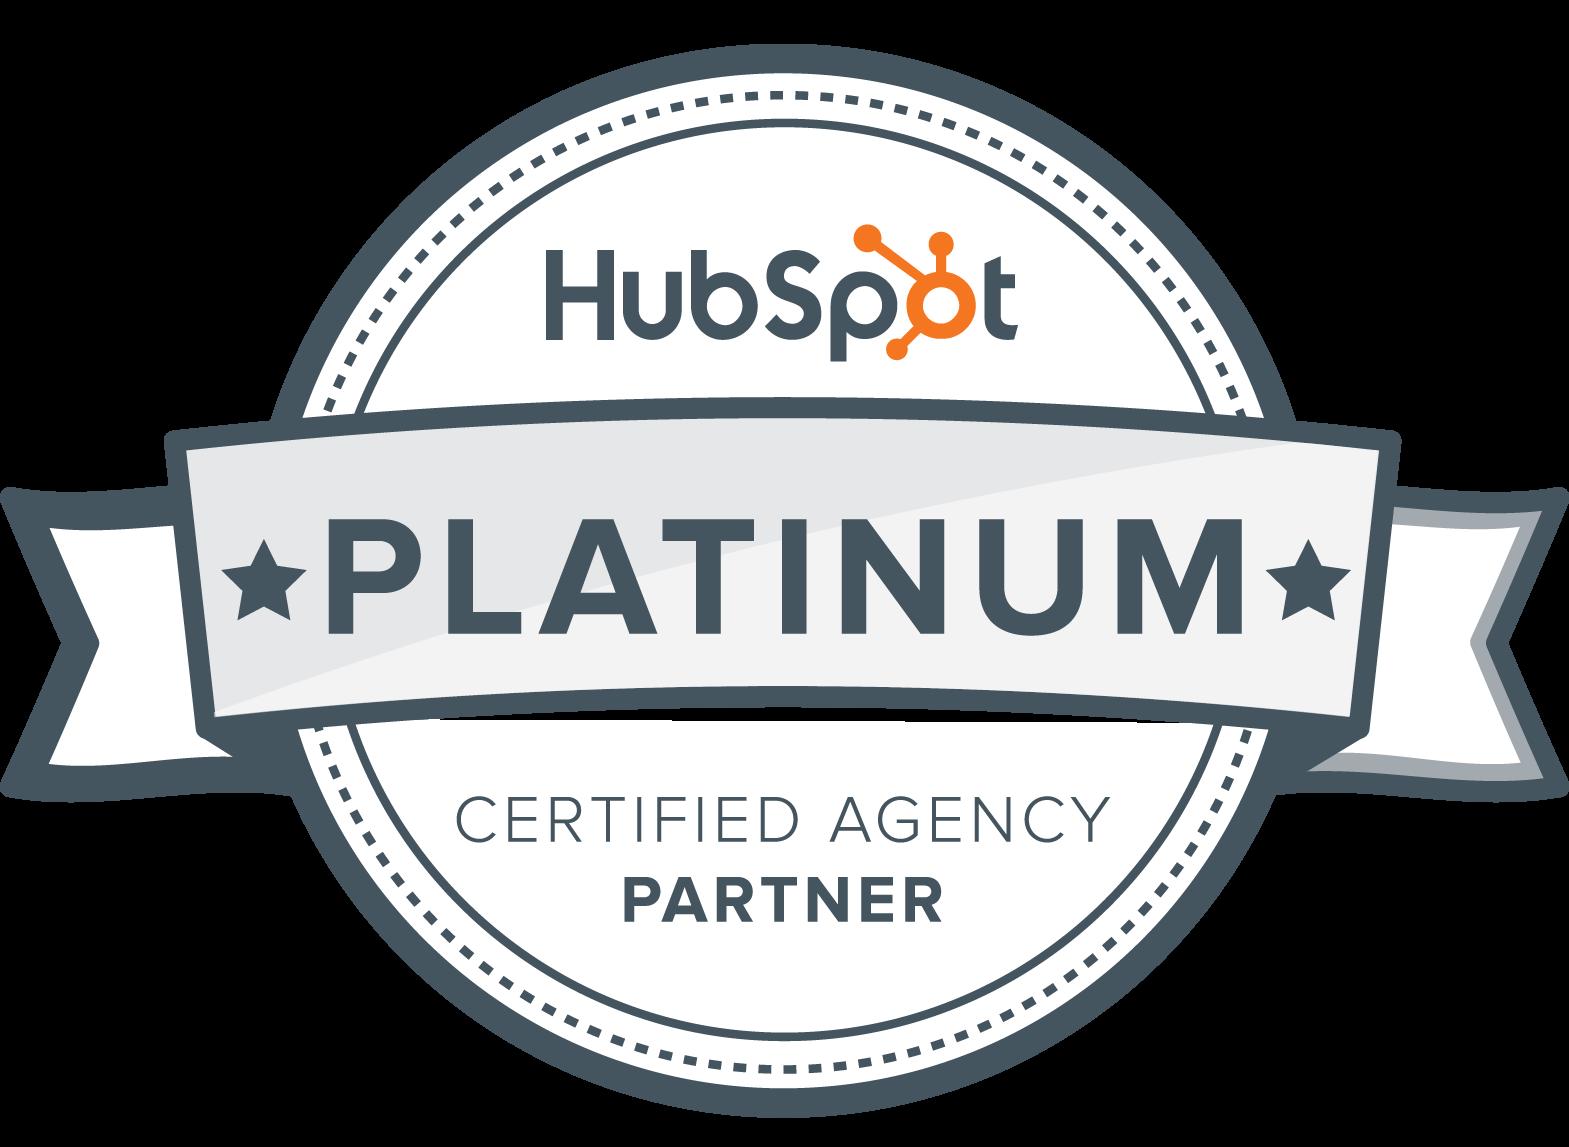 Platinum hubspot partners